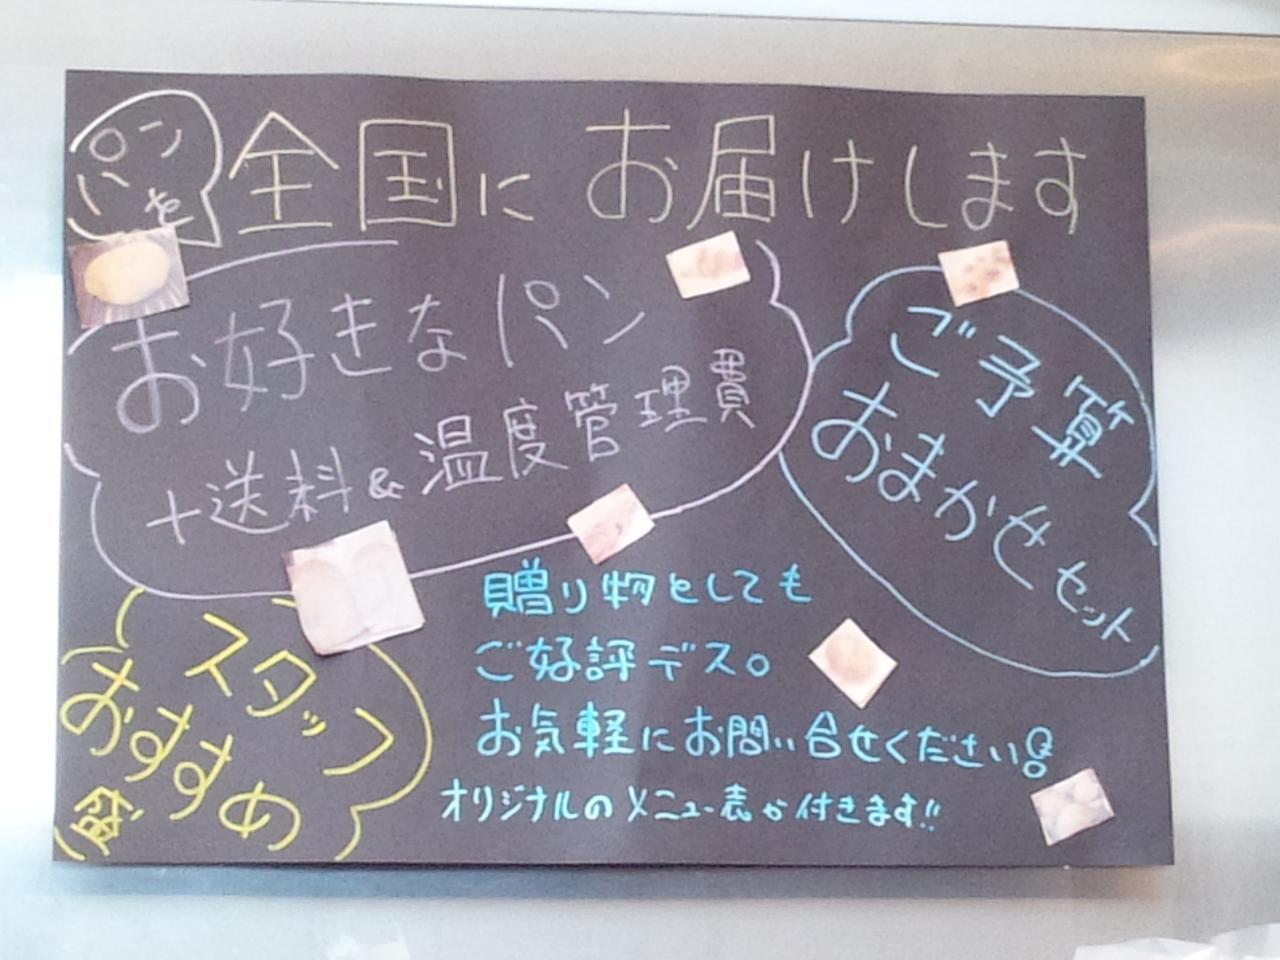 BLUE_CORNER(メニュー)